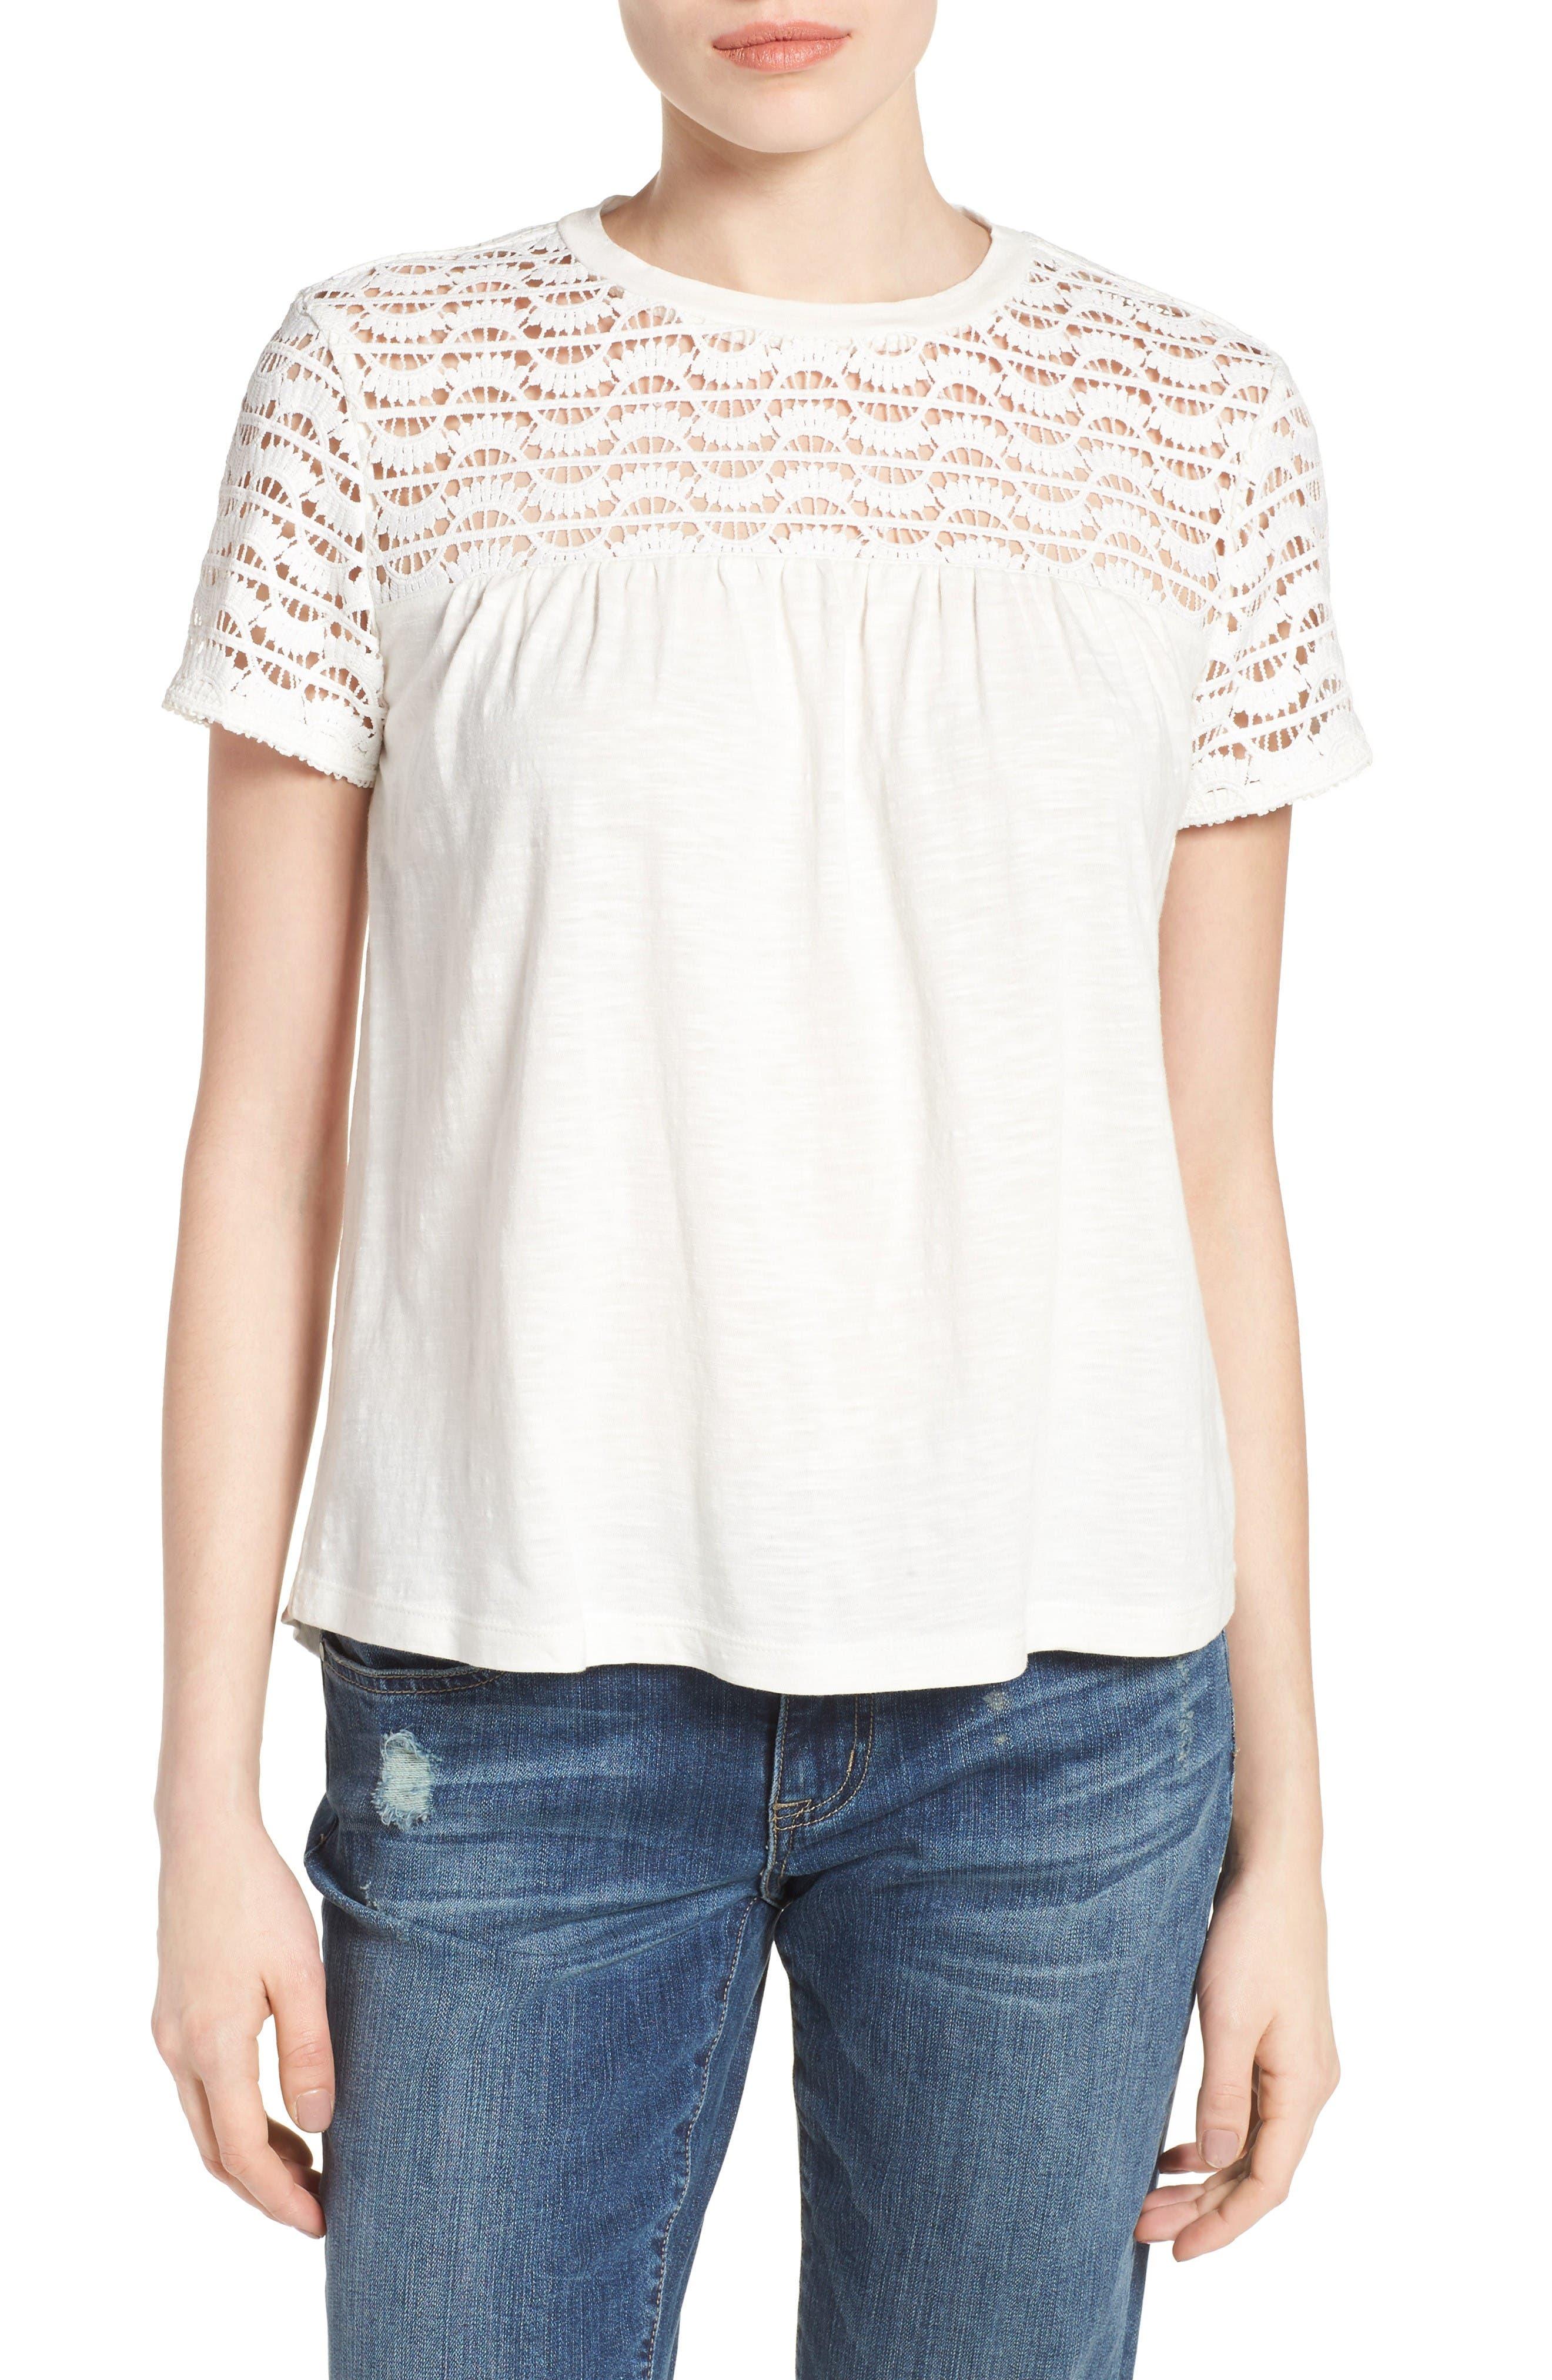 Alternate Image 1 Selected - Caslon® Lace Yoke Knit Top (Regular and Petite)